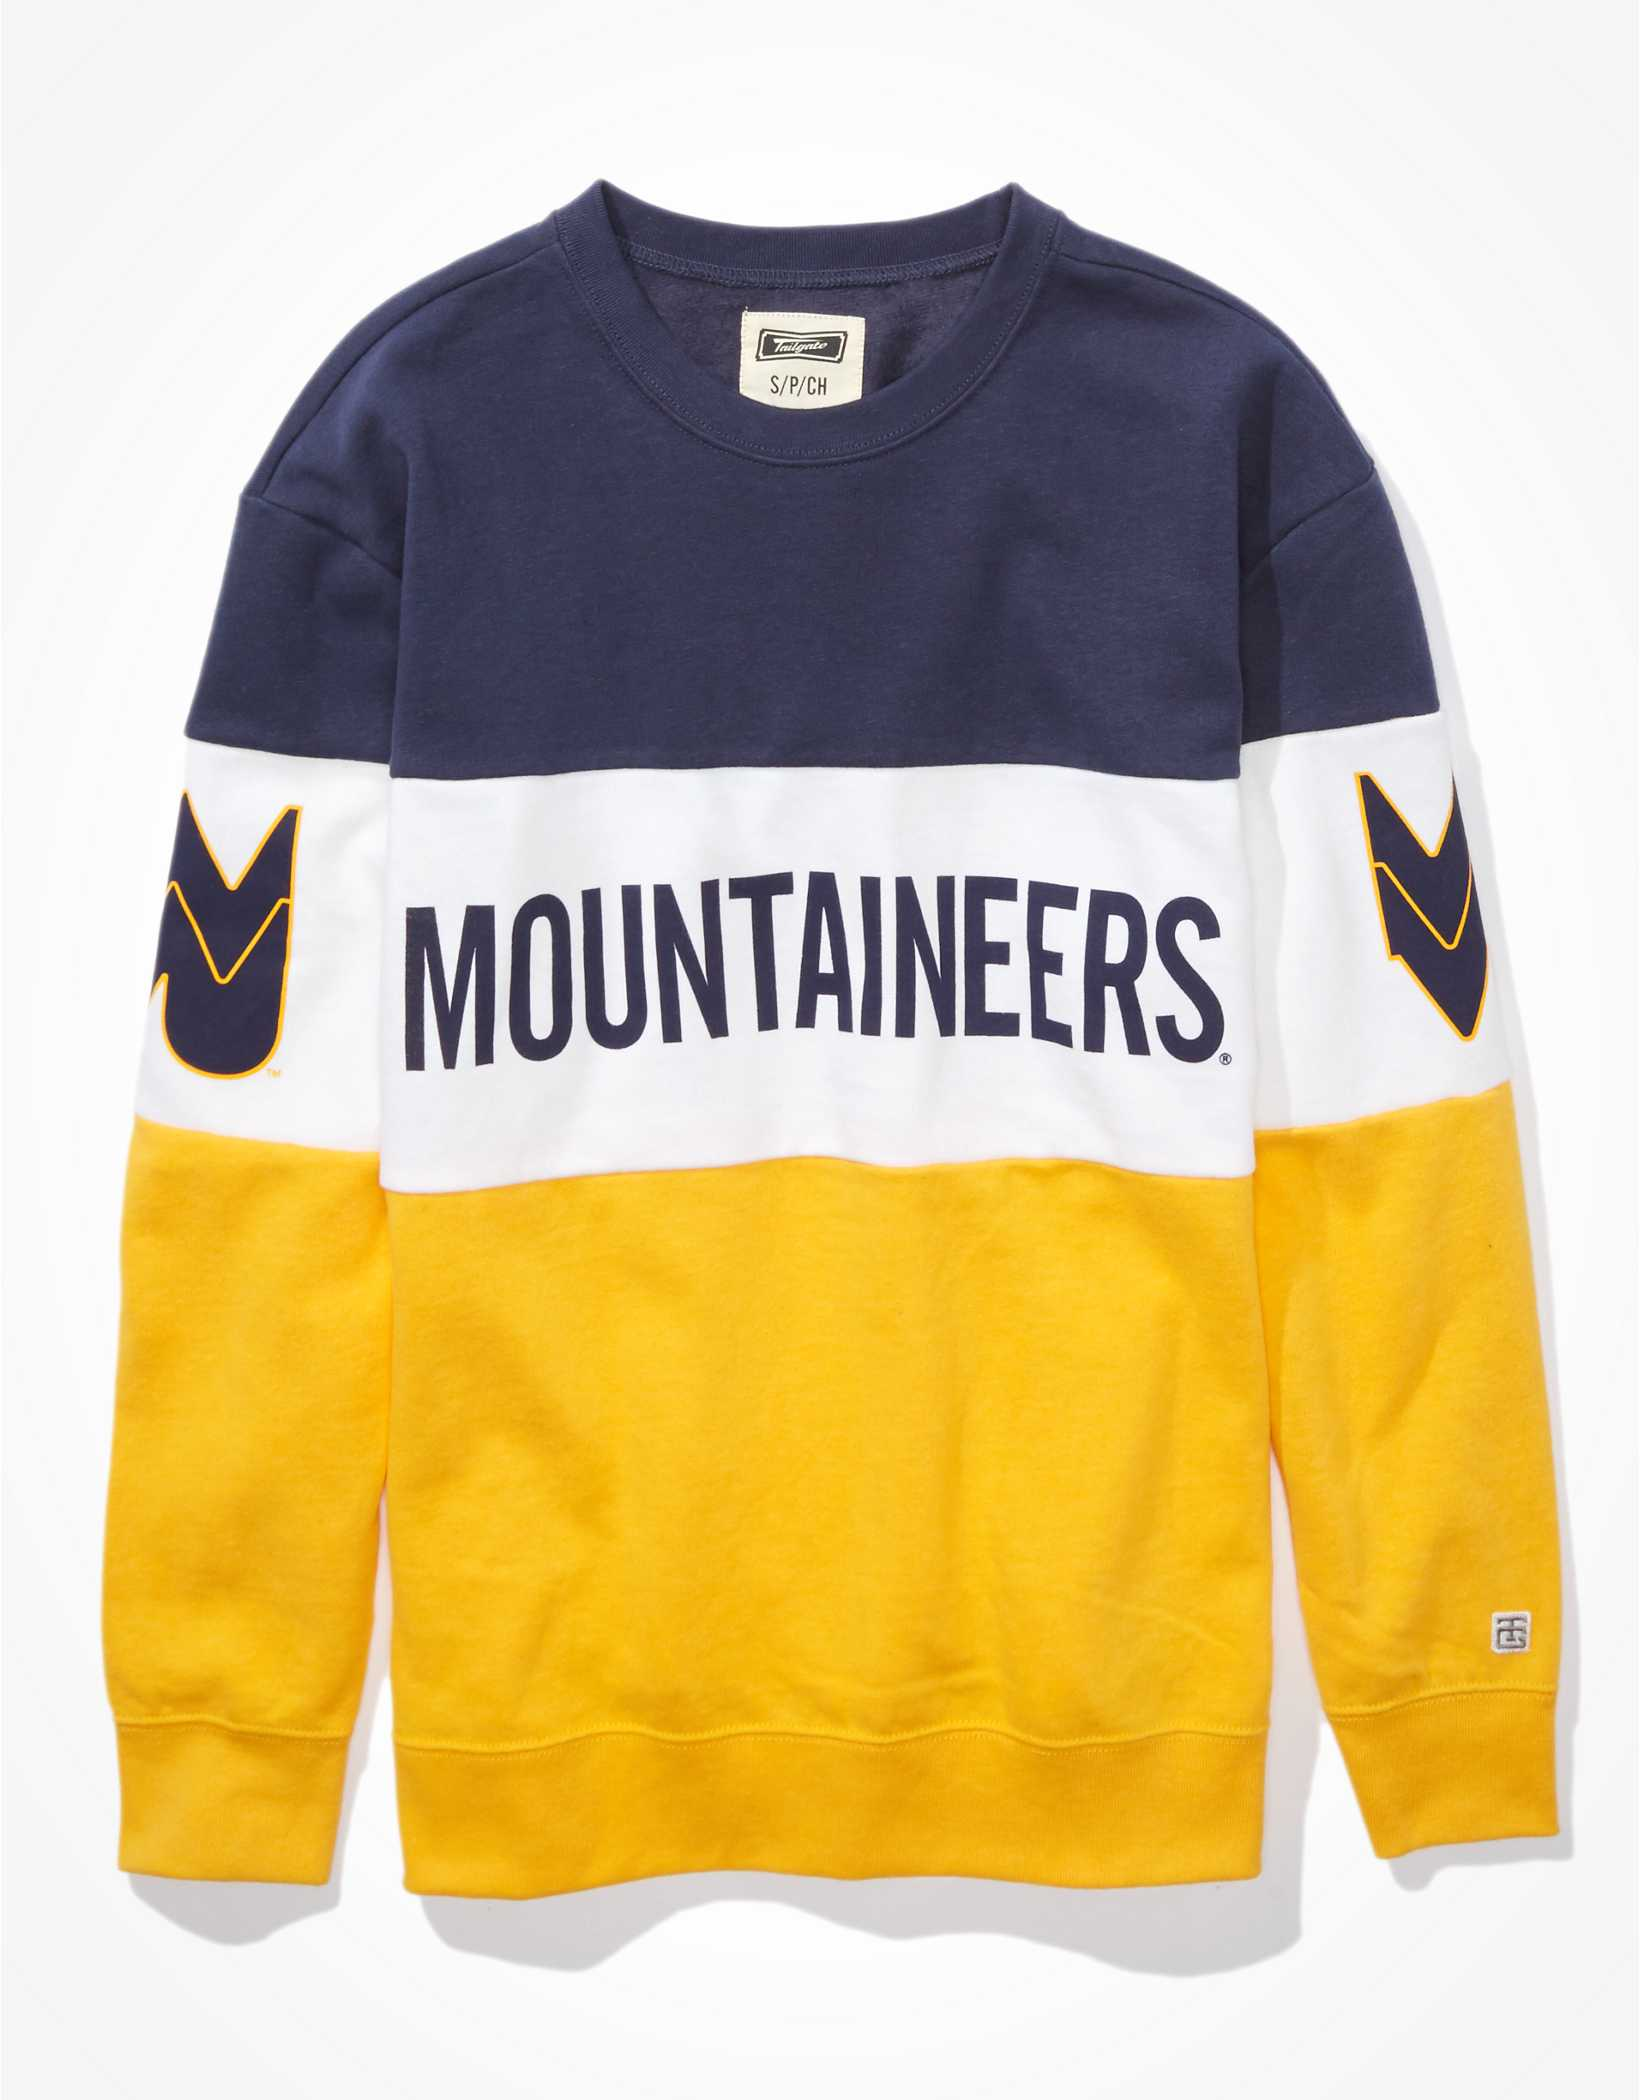 Tailgate Women's WVU Mountaineers Colorblock Sweatshirt